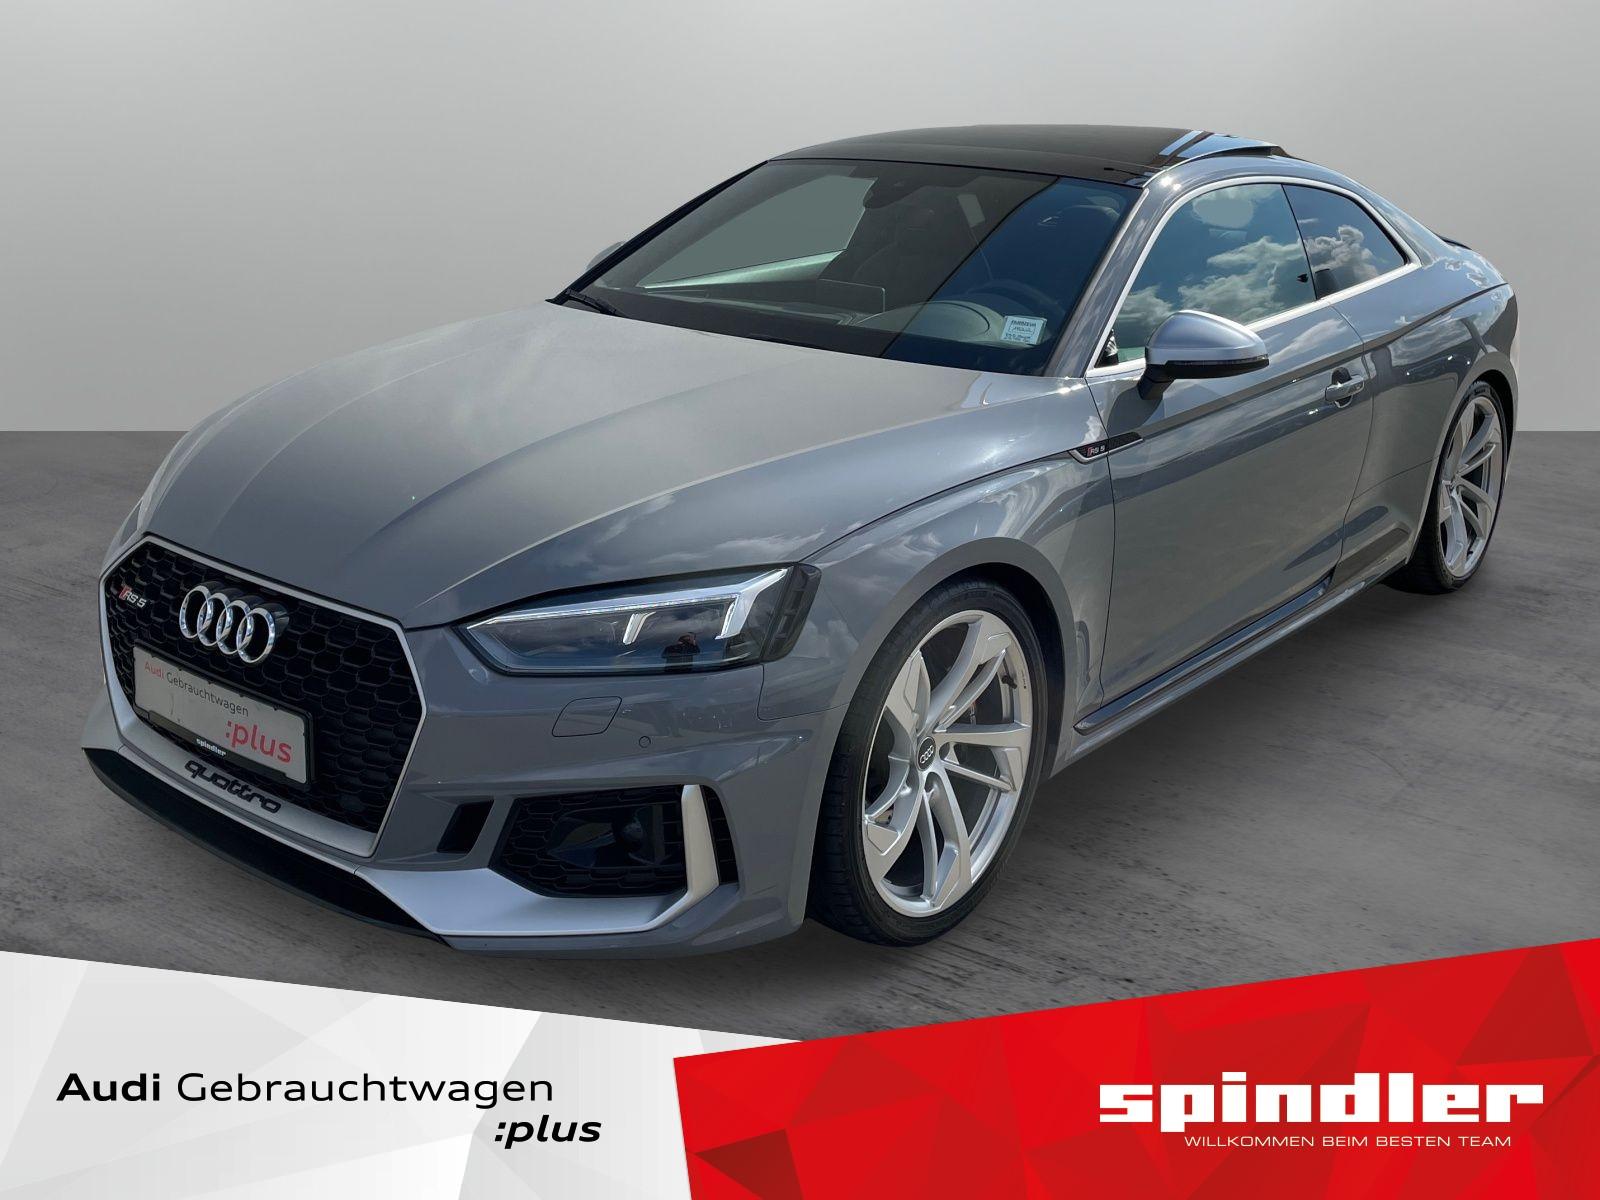 Audi RS 5 Coupé 2.9 TFSI Quattro / Matrix, Vmax 280, Jahr 2018, Benzin